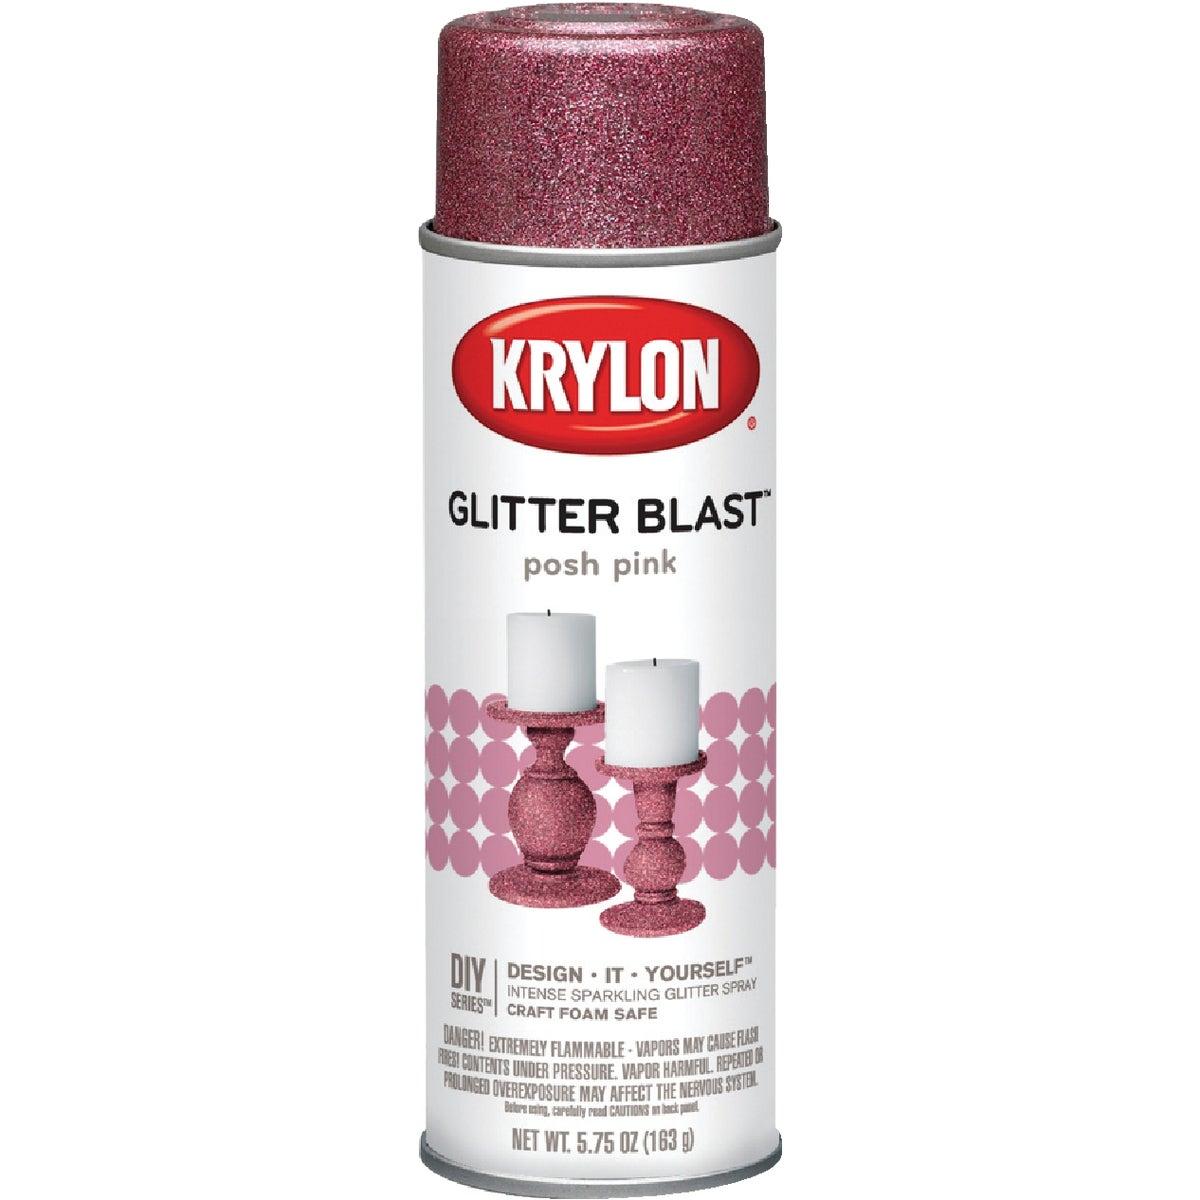 POSH PINK GLITTER SPRAY - K03812000 by Krylon/consumer Div